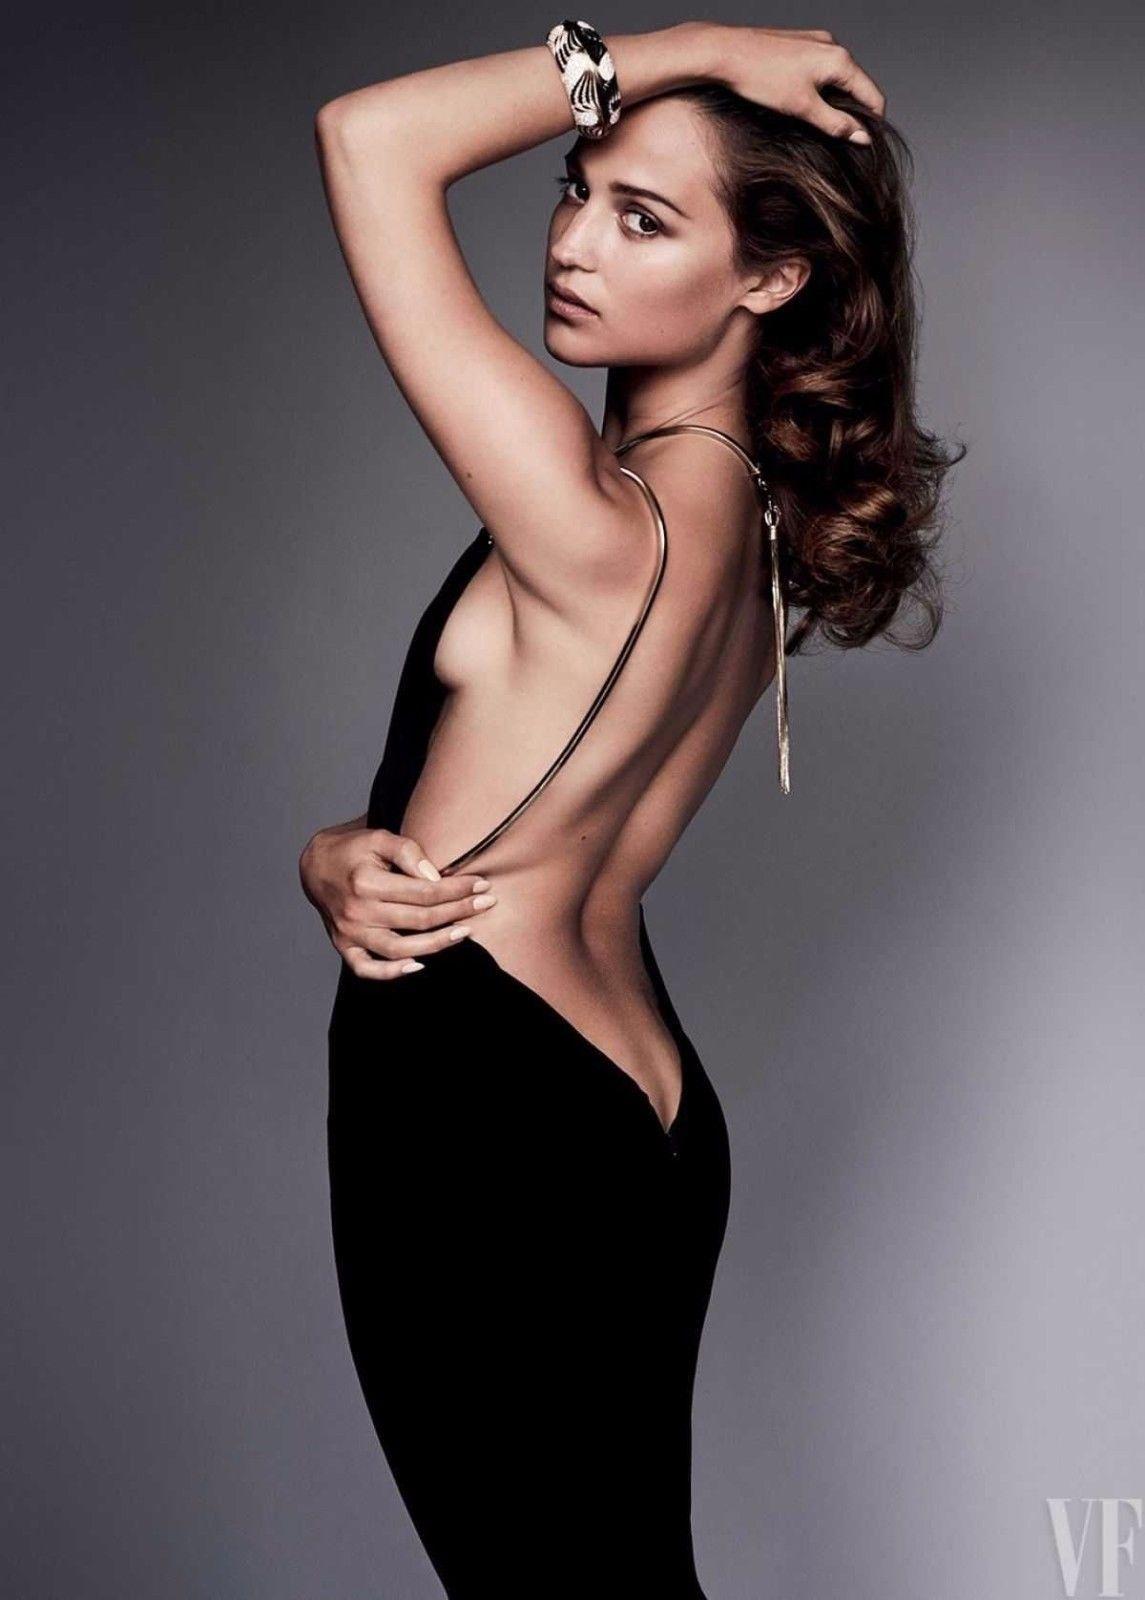 Alicia vikander poster unzipping dress